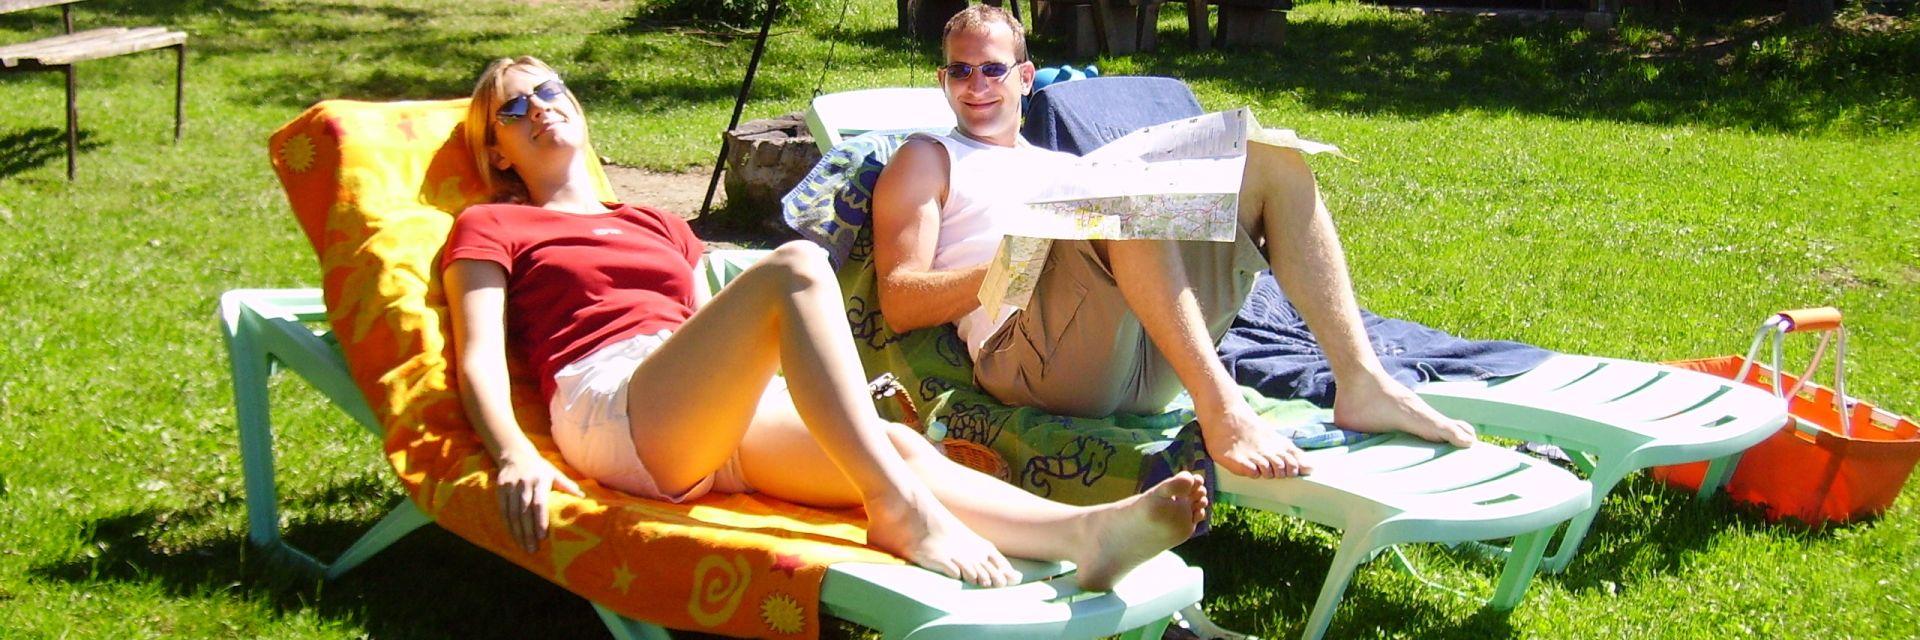 erholungsurlaub-bayerischer-wald-liegewiese-relaxenruhe-entspannung